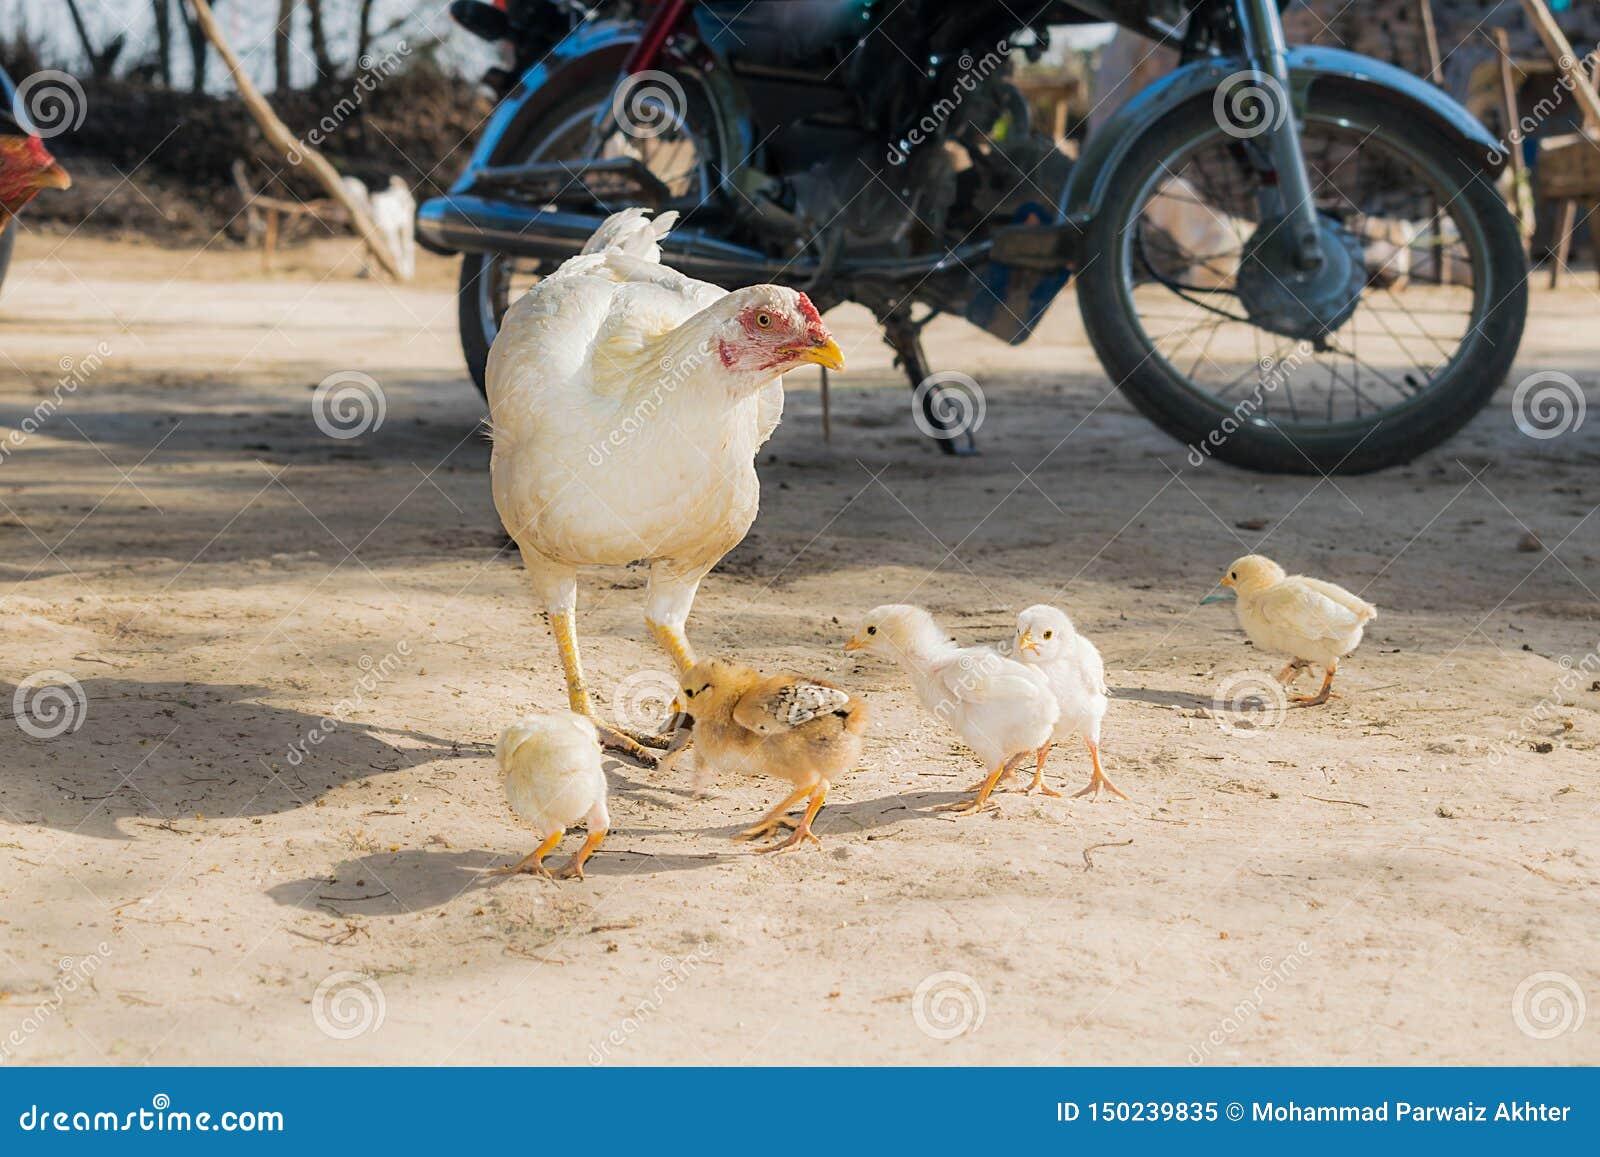 A female white hen feeding its little chicks